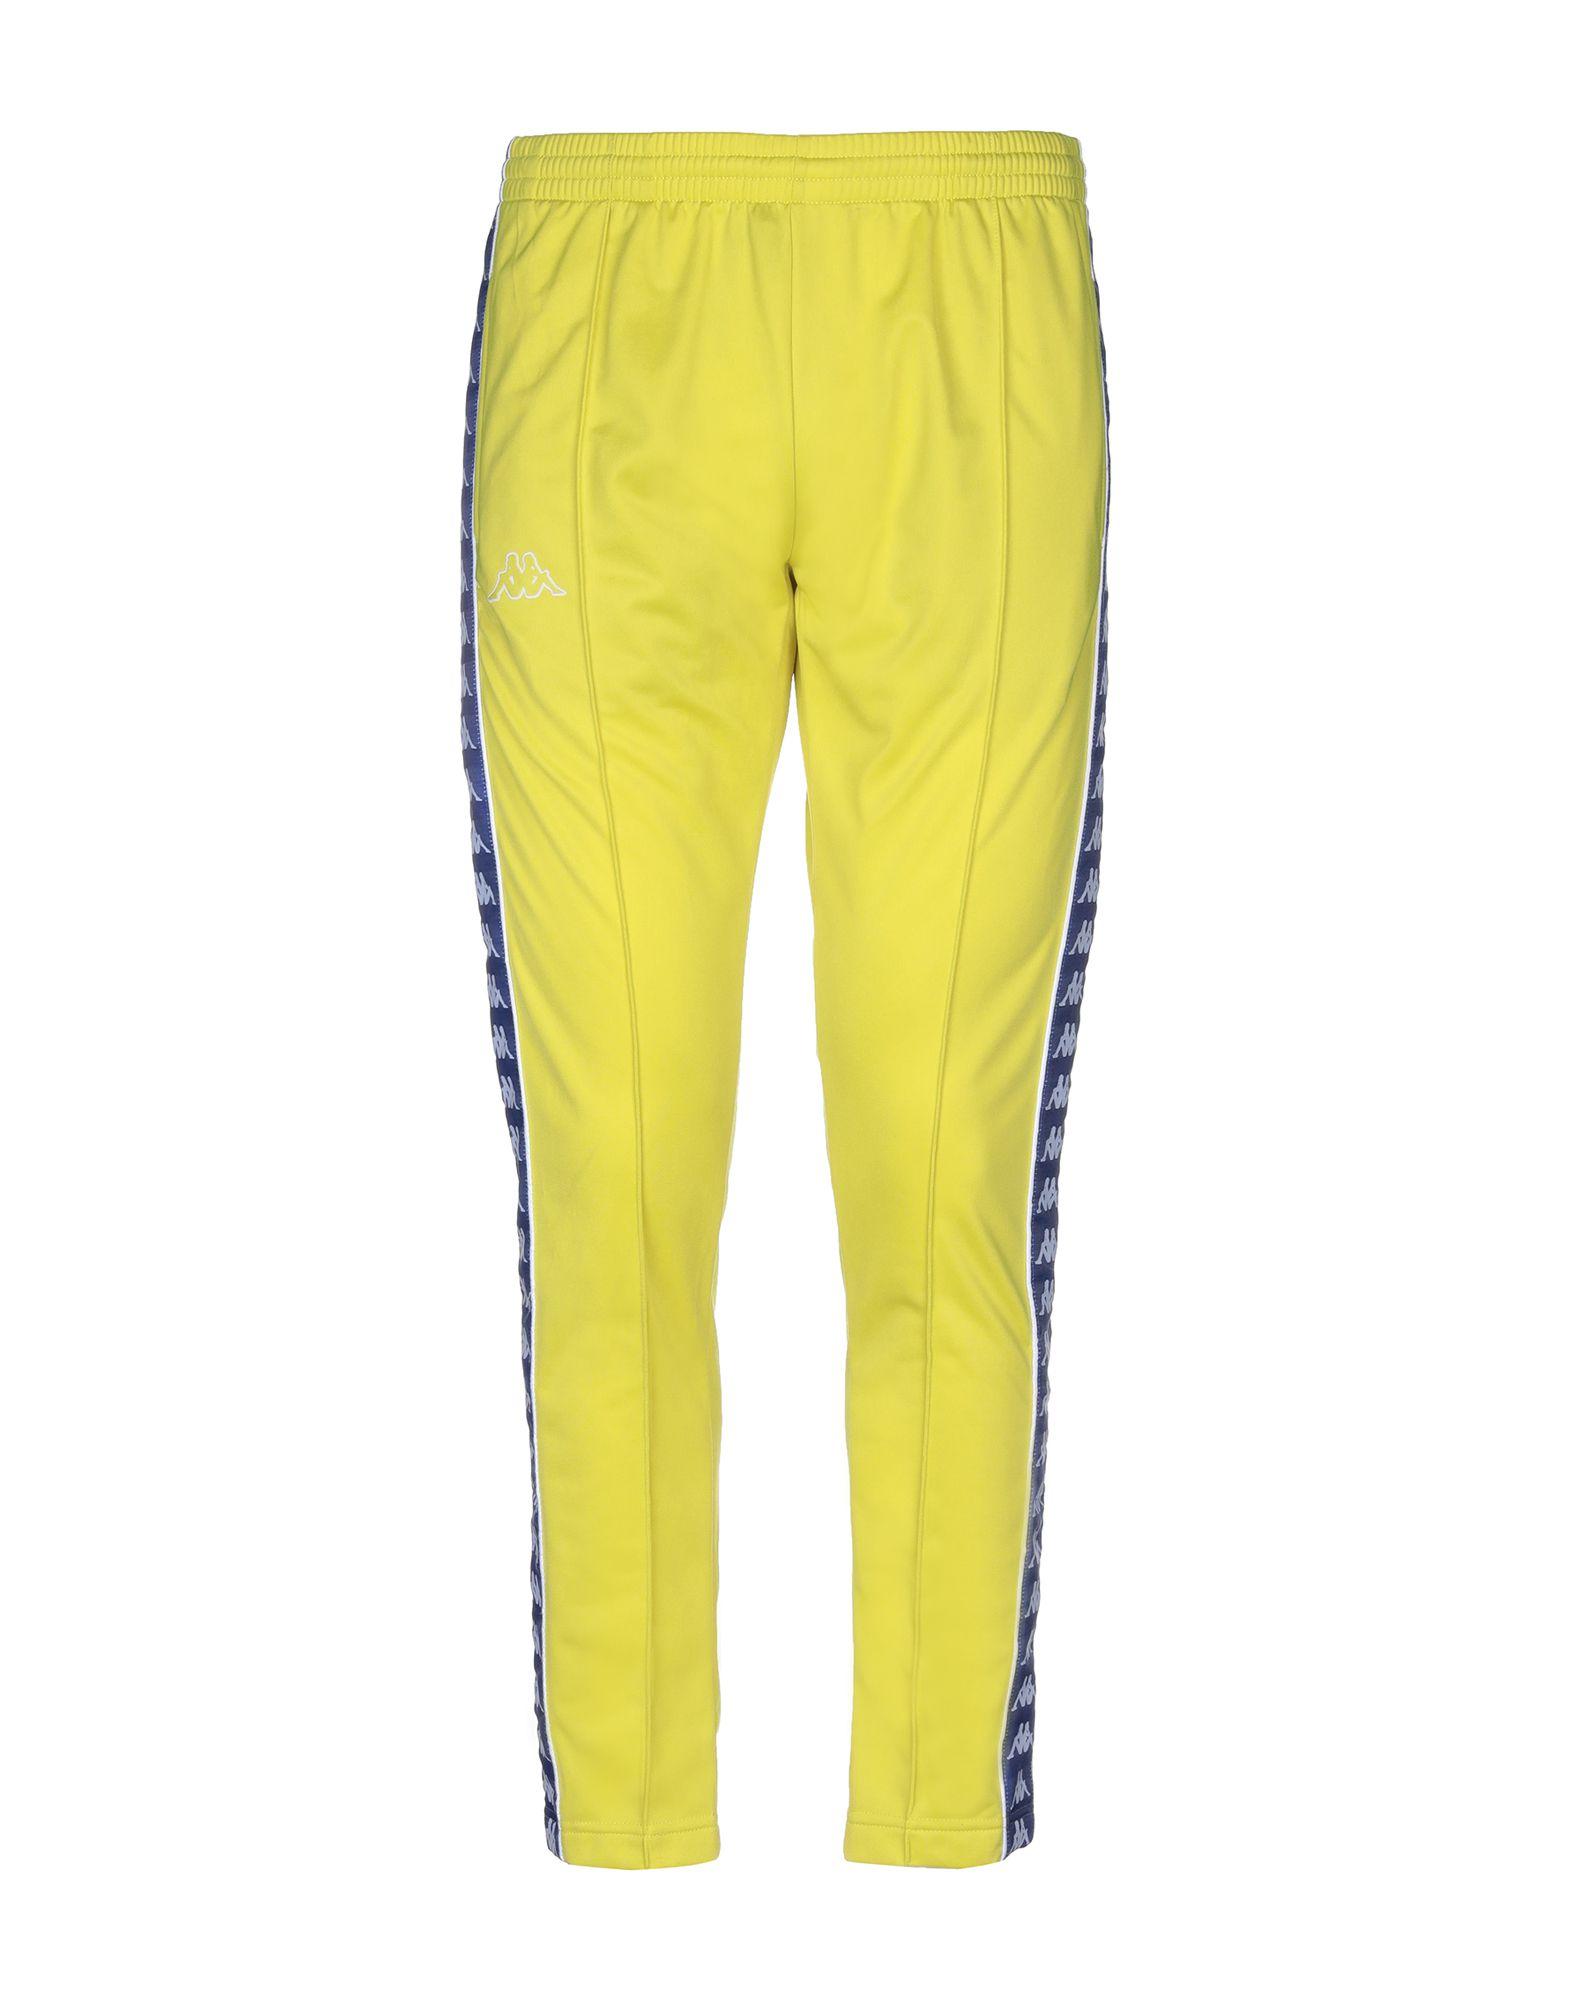 KAPPA Повседневные брюки спортивная ветровка kappa 15 k0512fj06